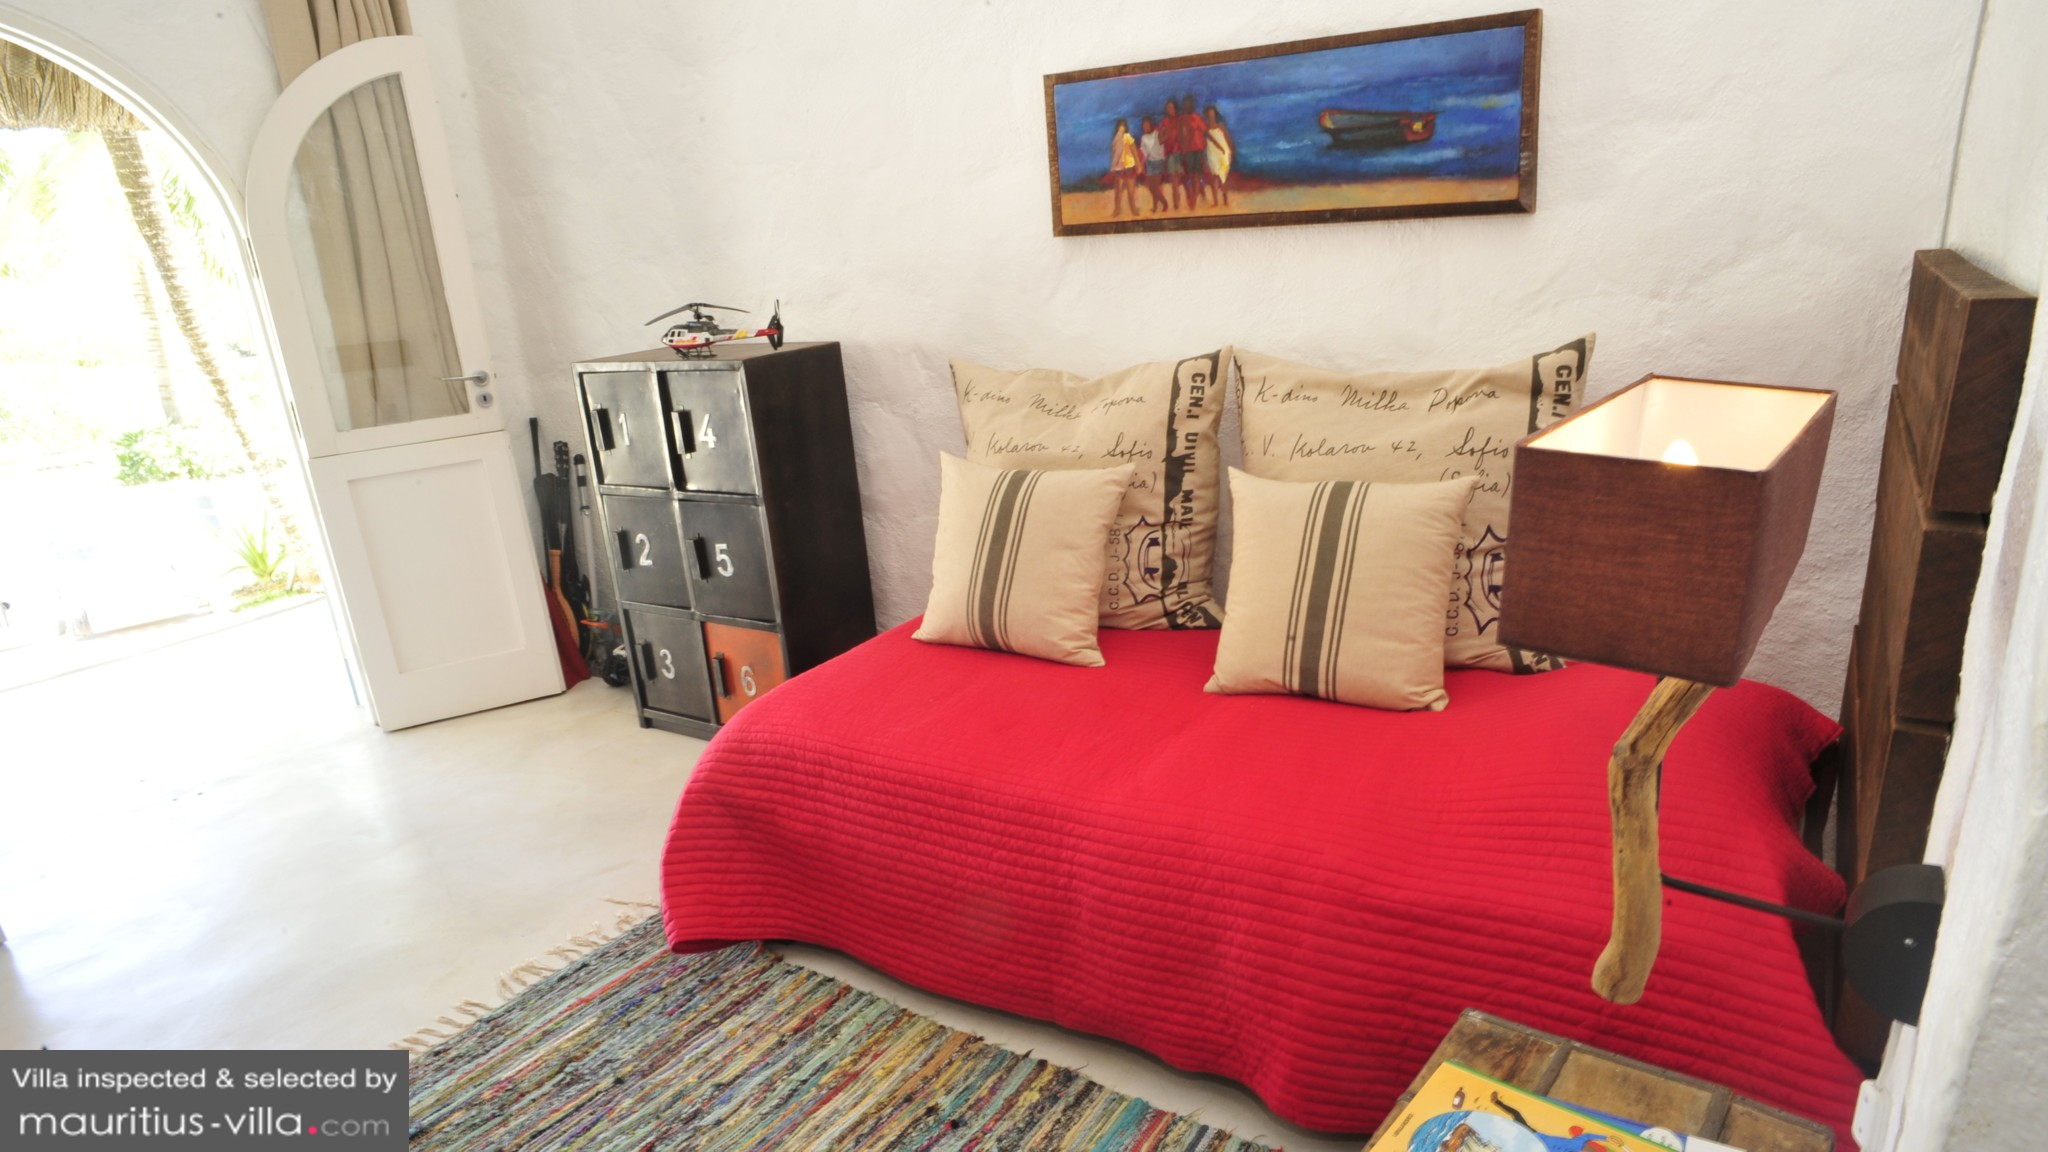 villa-de-luxe-ile-maurice-location-villa-ile-maurice-villa-rental-mauritius-villa-sable-et-mer-chambre-a-coucher